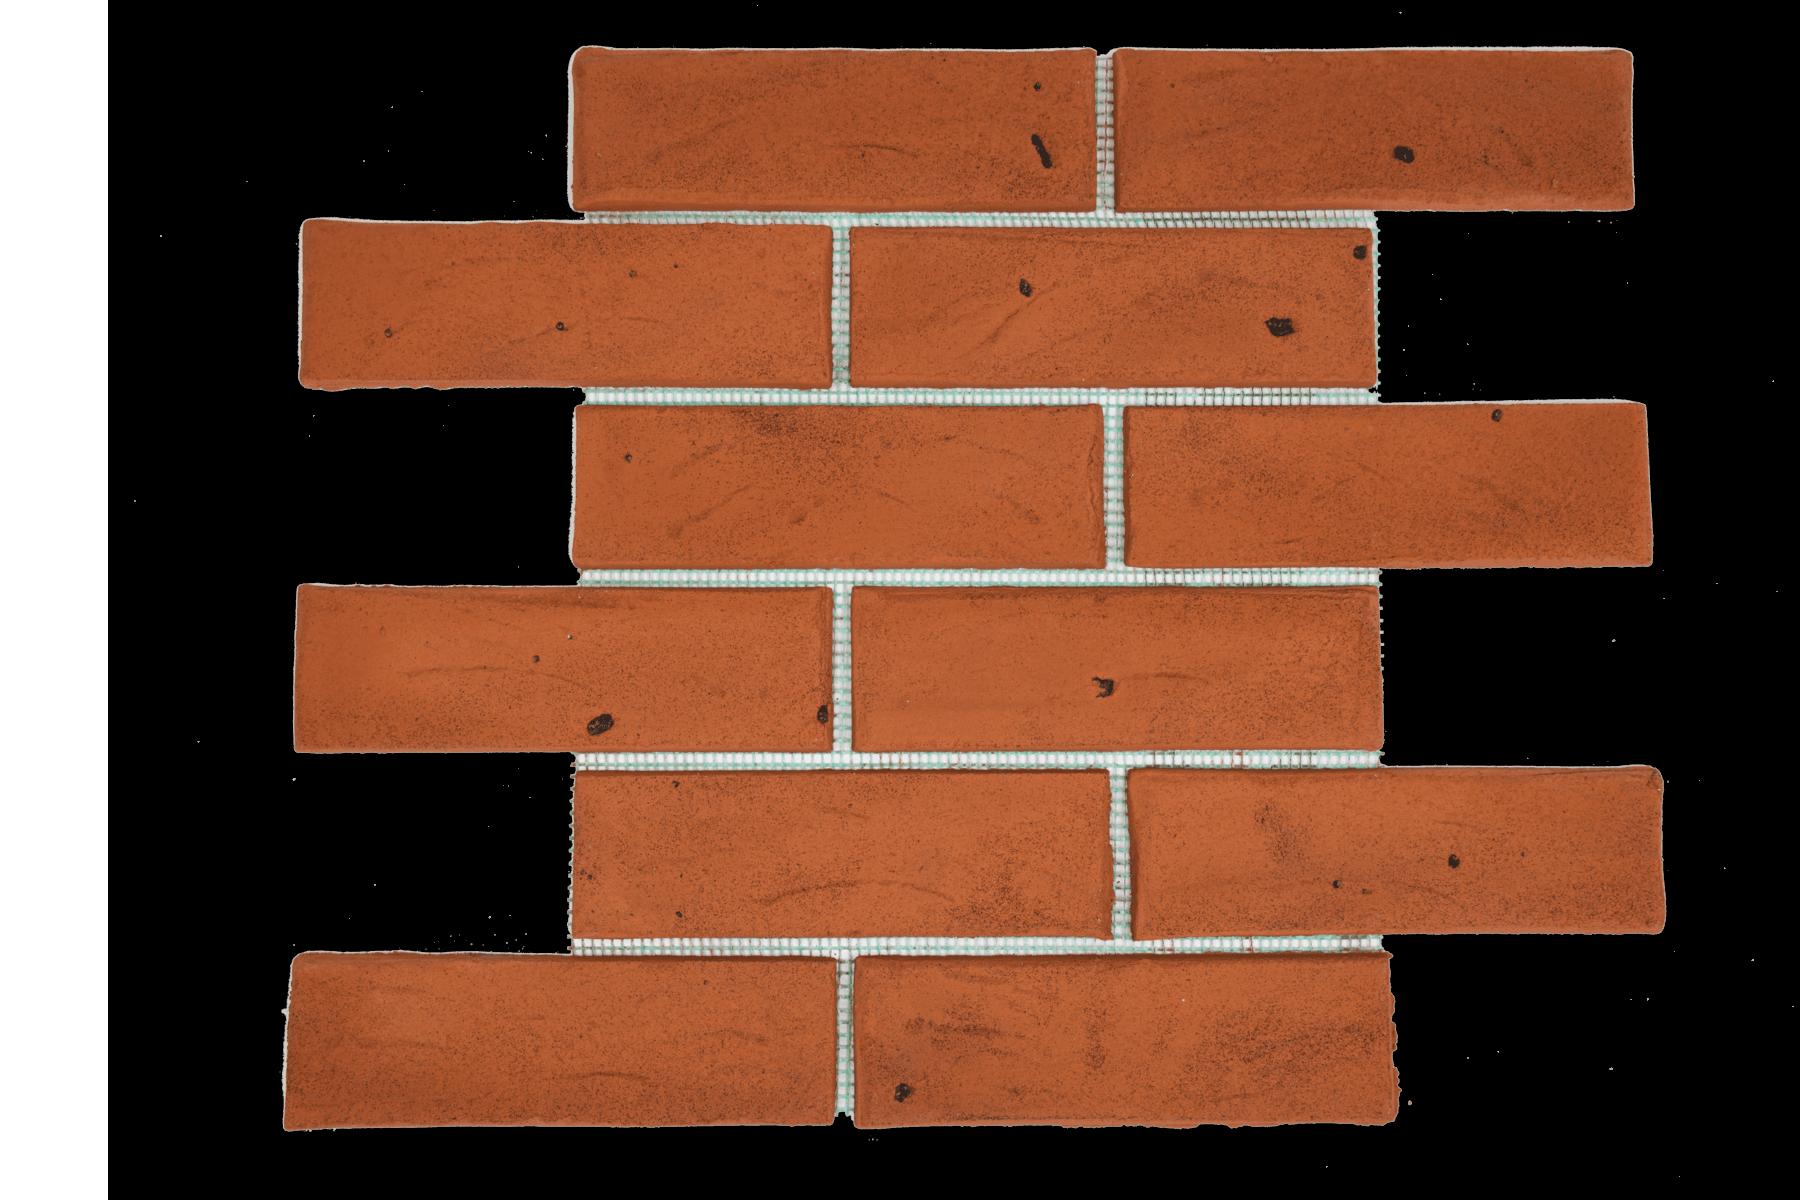 BrickPlus Pro Panel